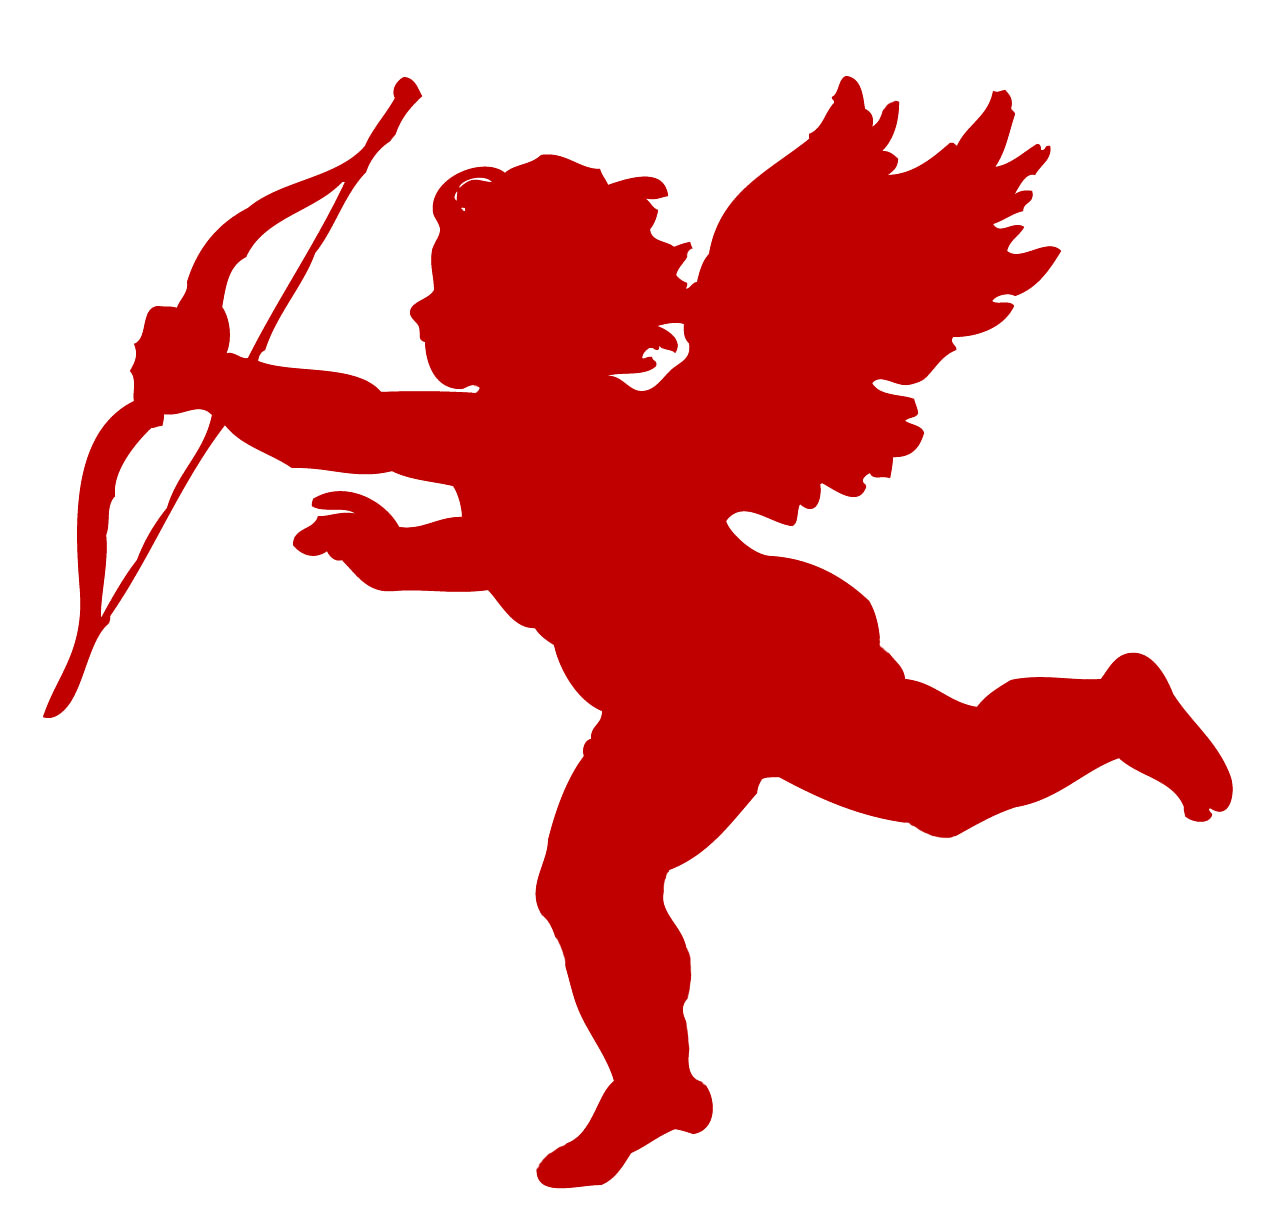 www.cupid.com